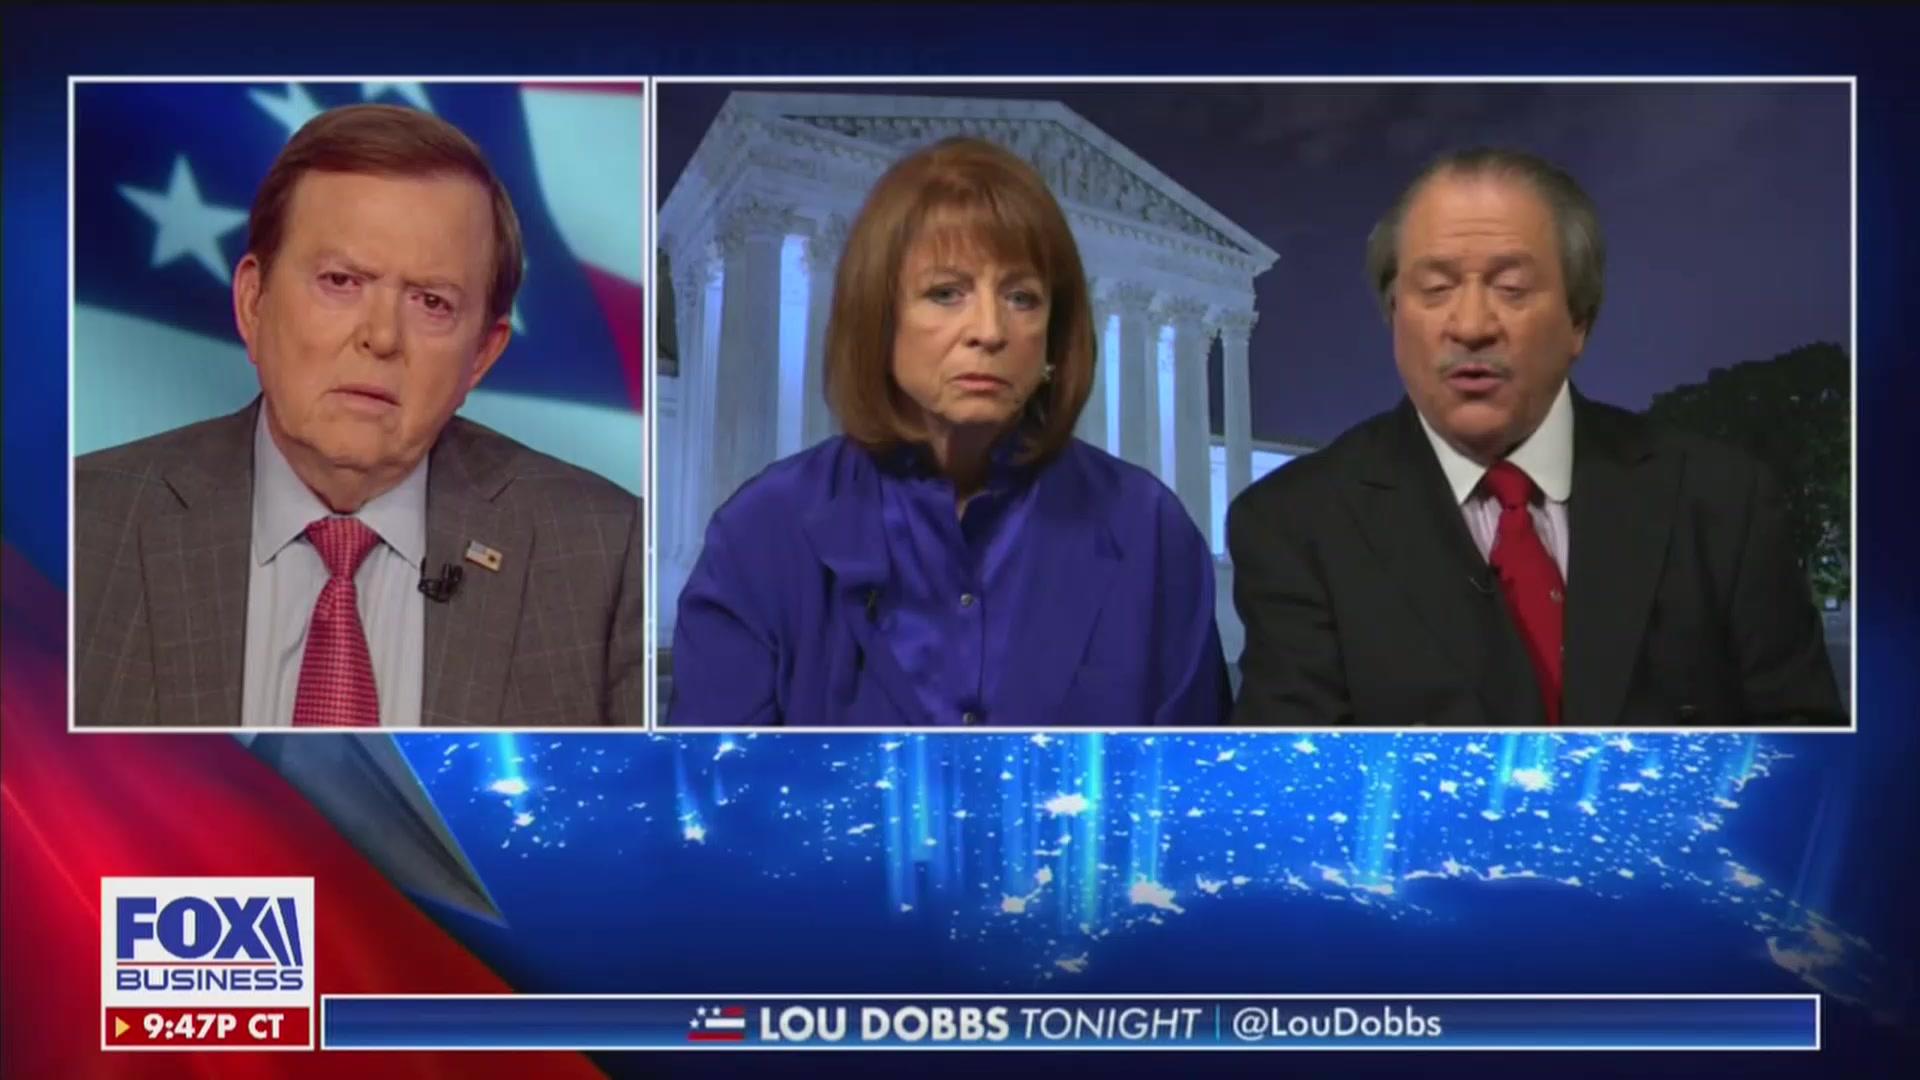 Joe diGenova to Fox's Lou Dobbs: Chris Wallace's Report 'Was Clearly Designed as a Smear'